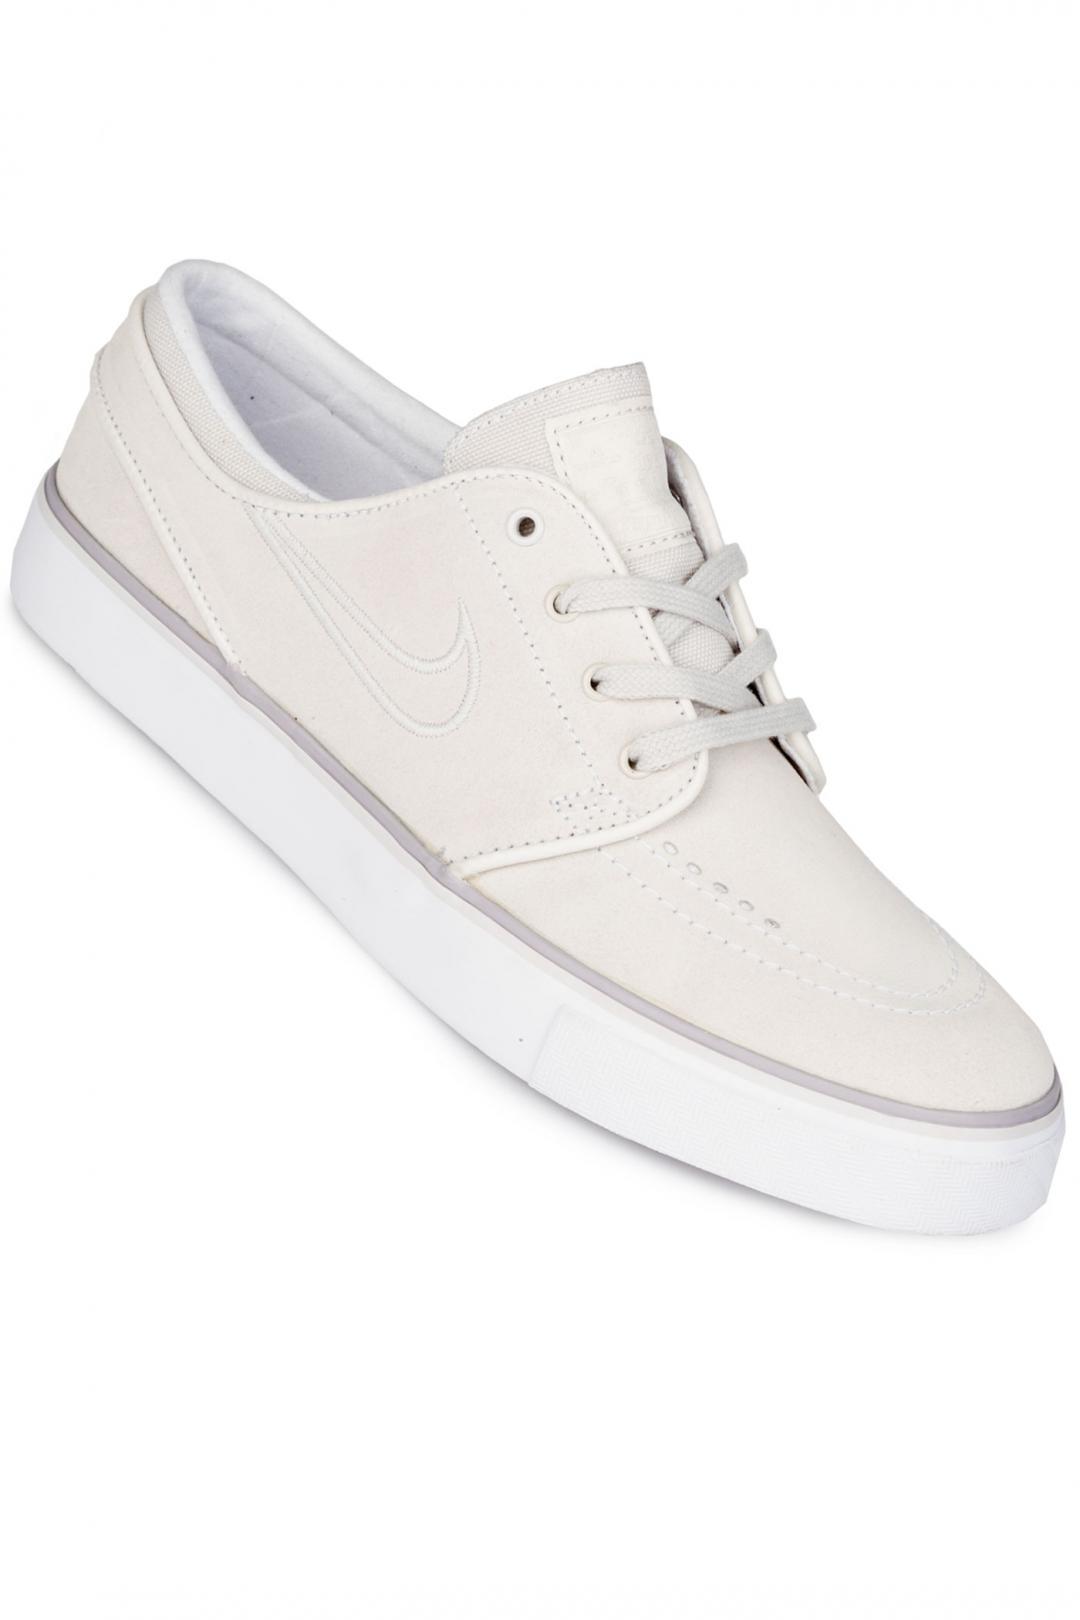 Donna Nike SB Zoom Stefan Janoski white white white | Sneakers low top